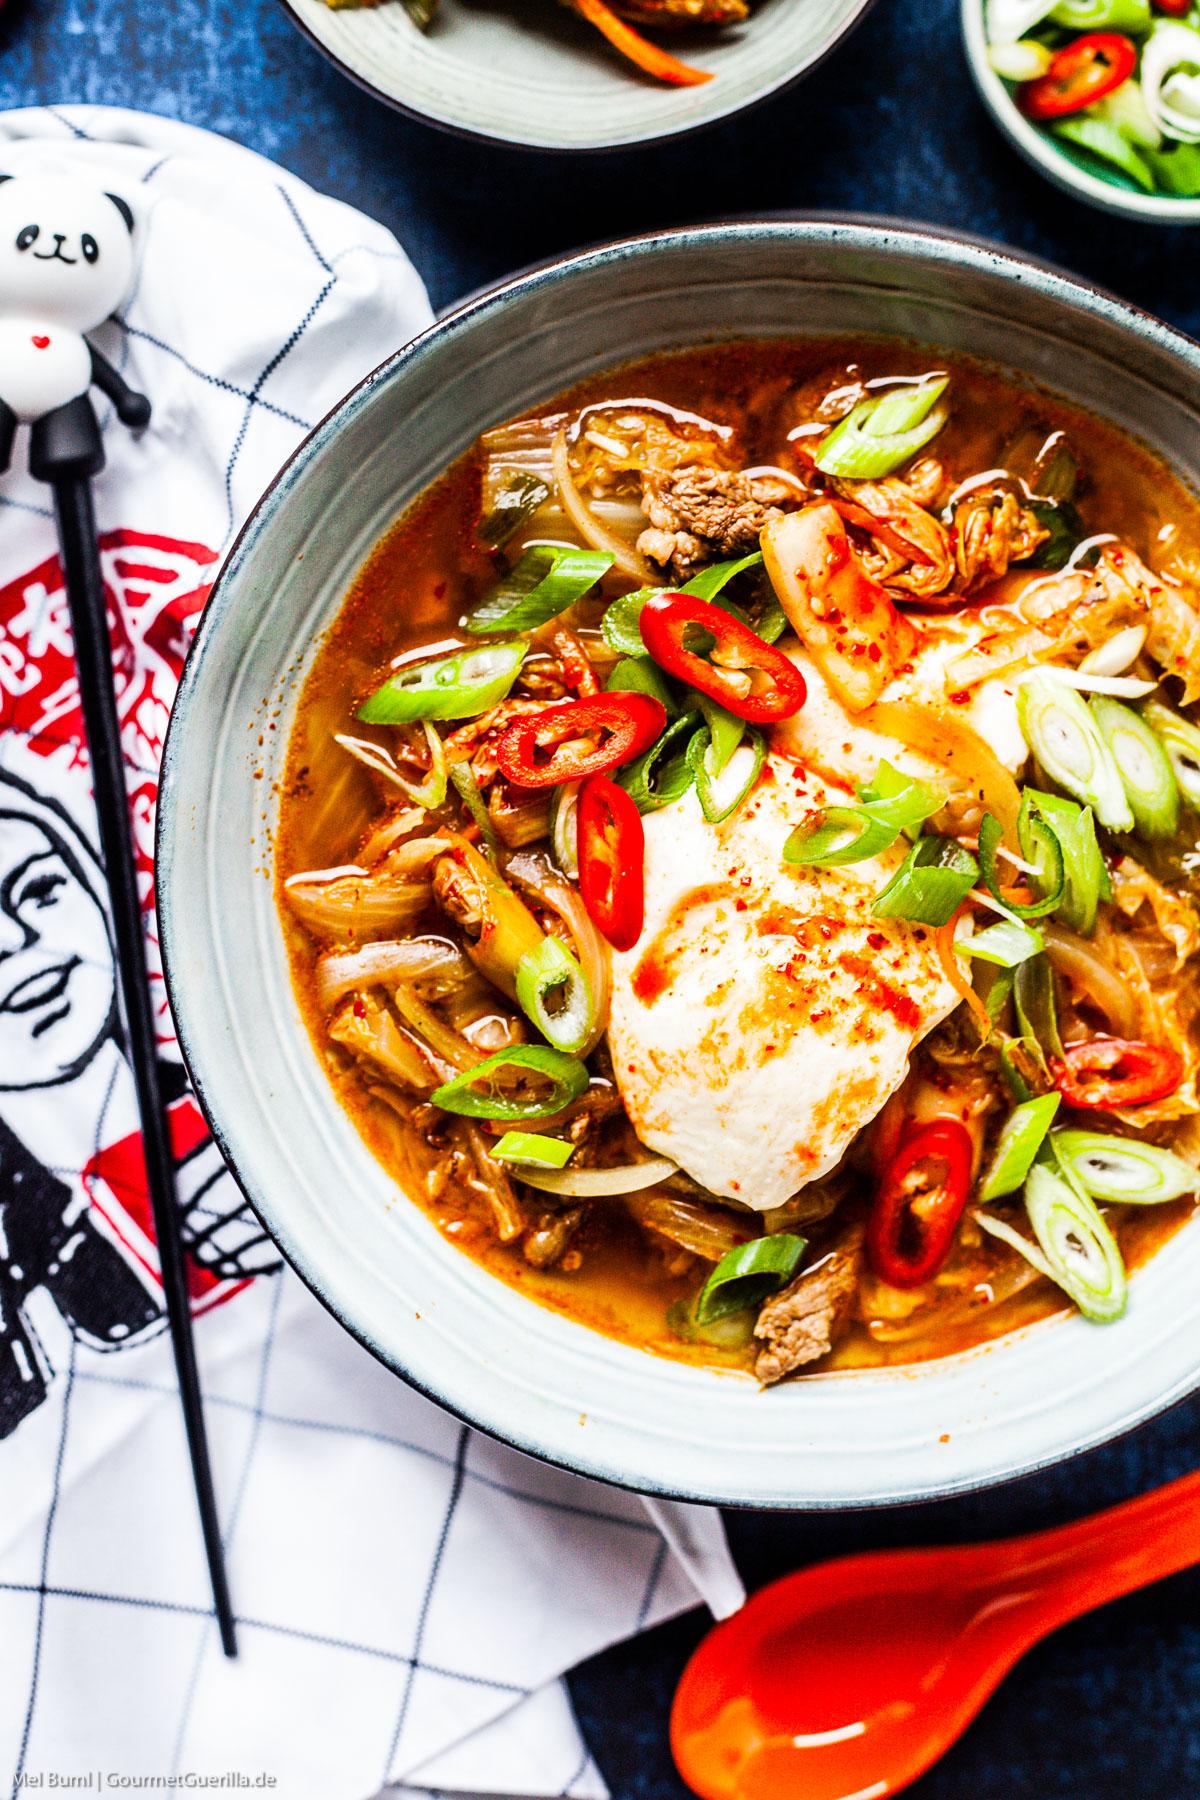 Schneller Koreanischer Tofu-Eintopf mit Kimchi Sundubu JJigae |GourmetGuerilla.de